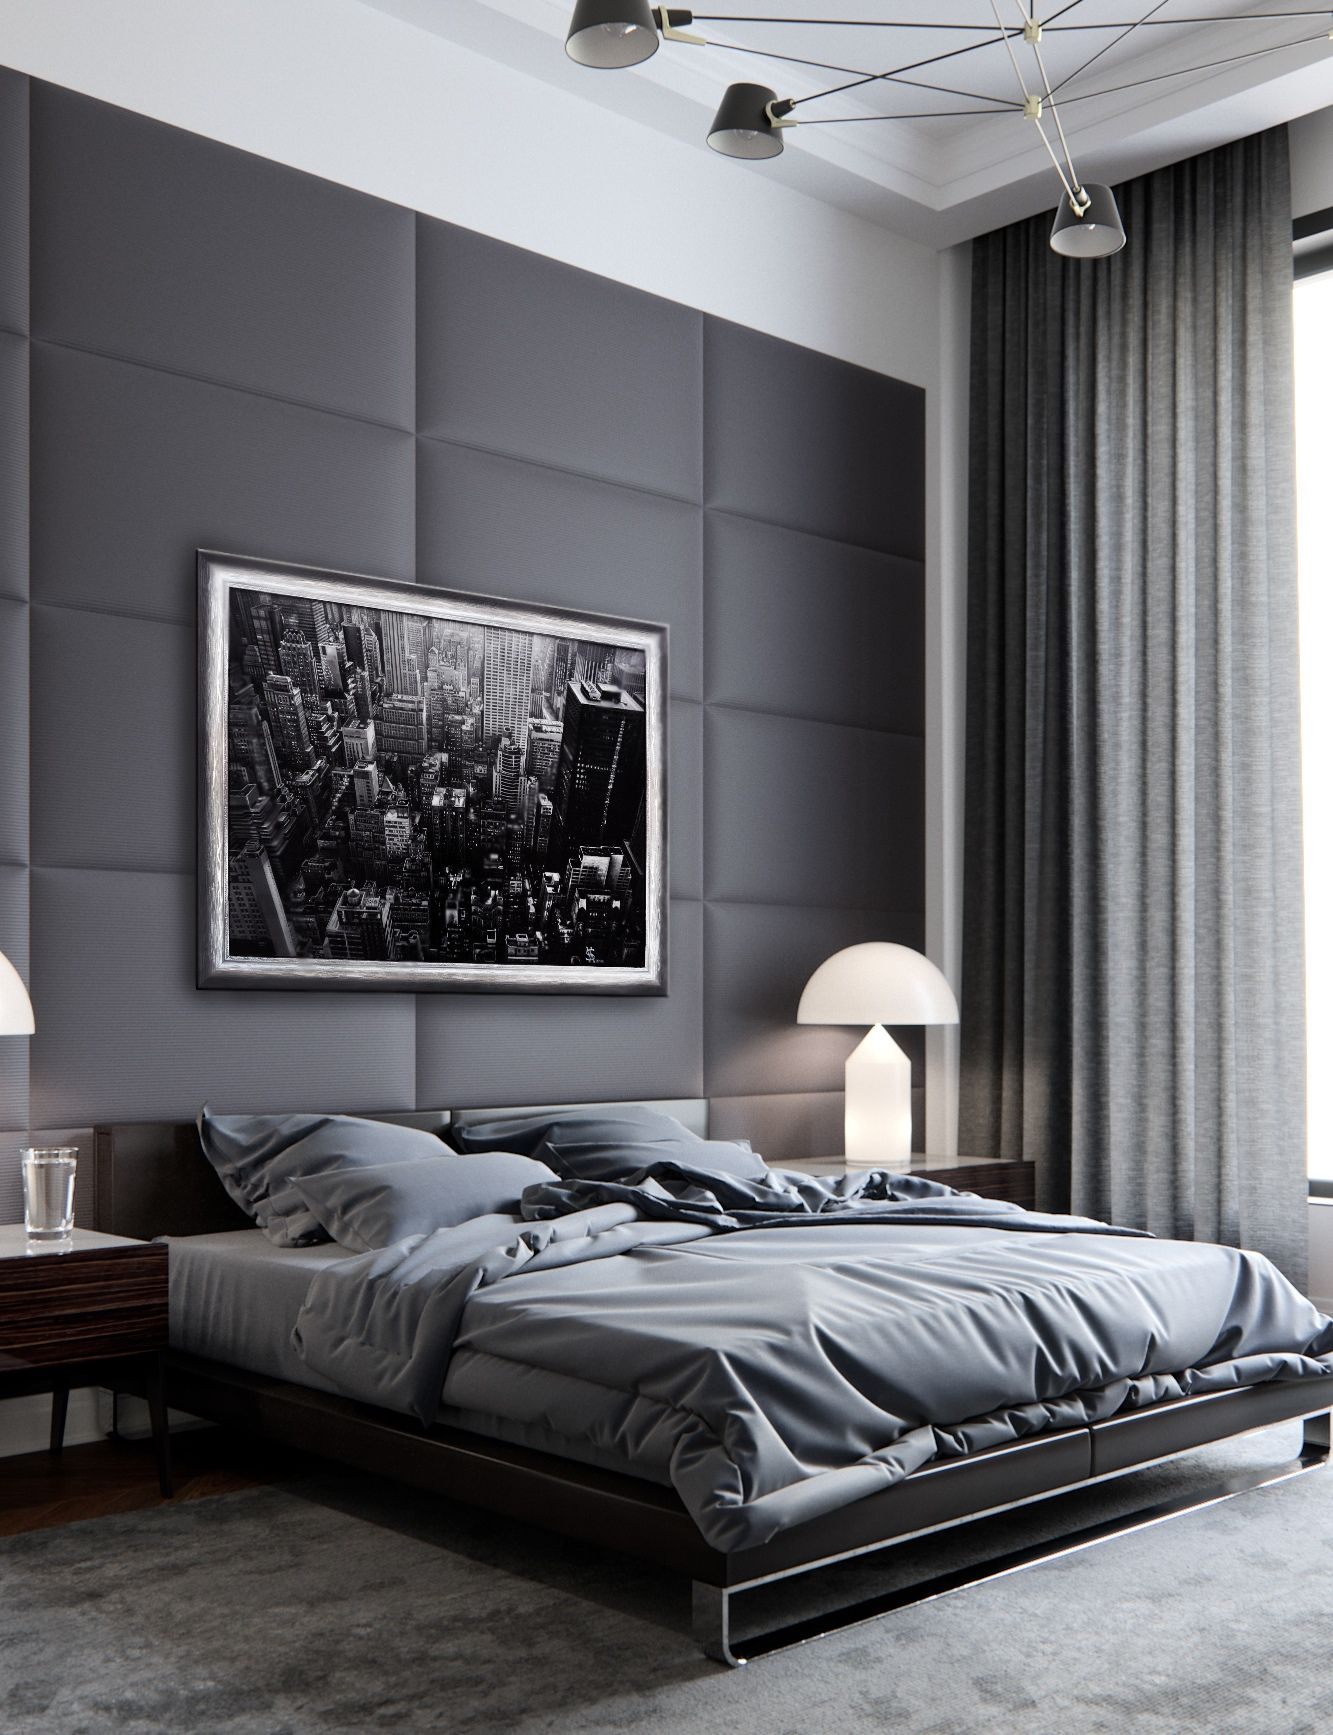 Oil Painting Original Oil Painting On Canvas Manhattan New York Cityscape Large Modern Art Luxury Bedroom Master Modern Master Bedroom Modern Bedroom Design